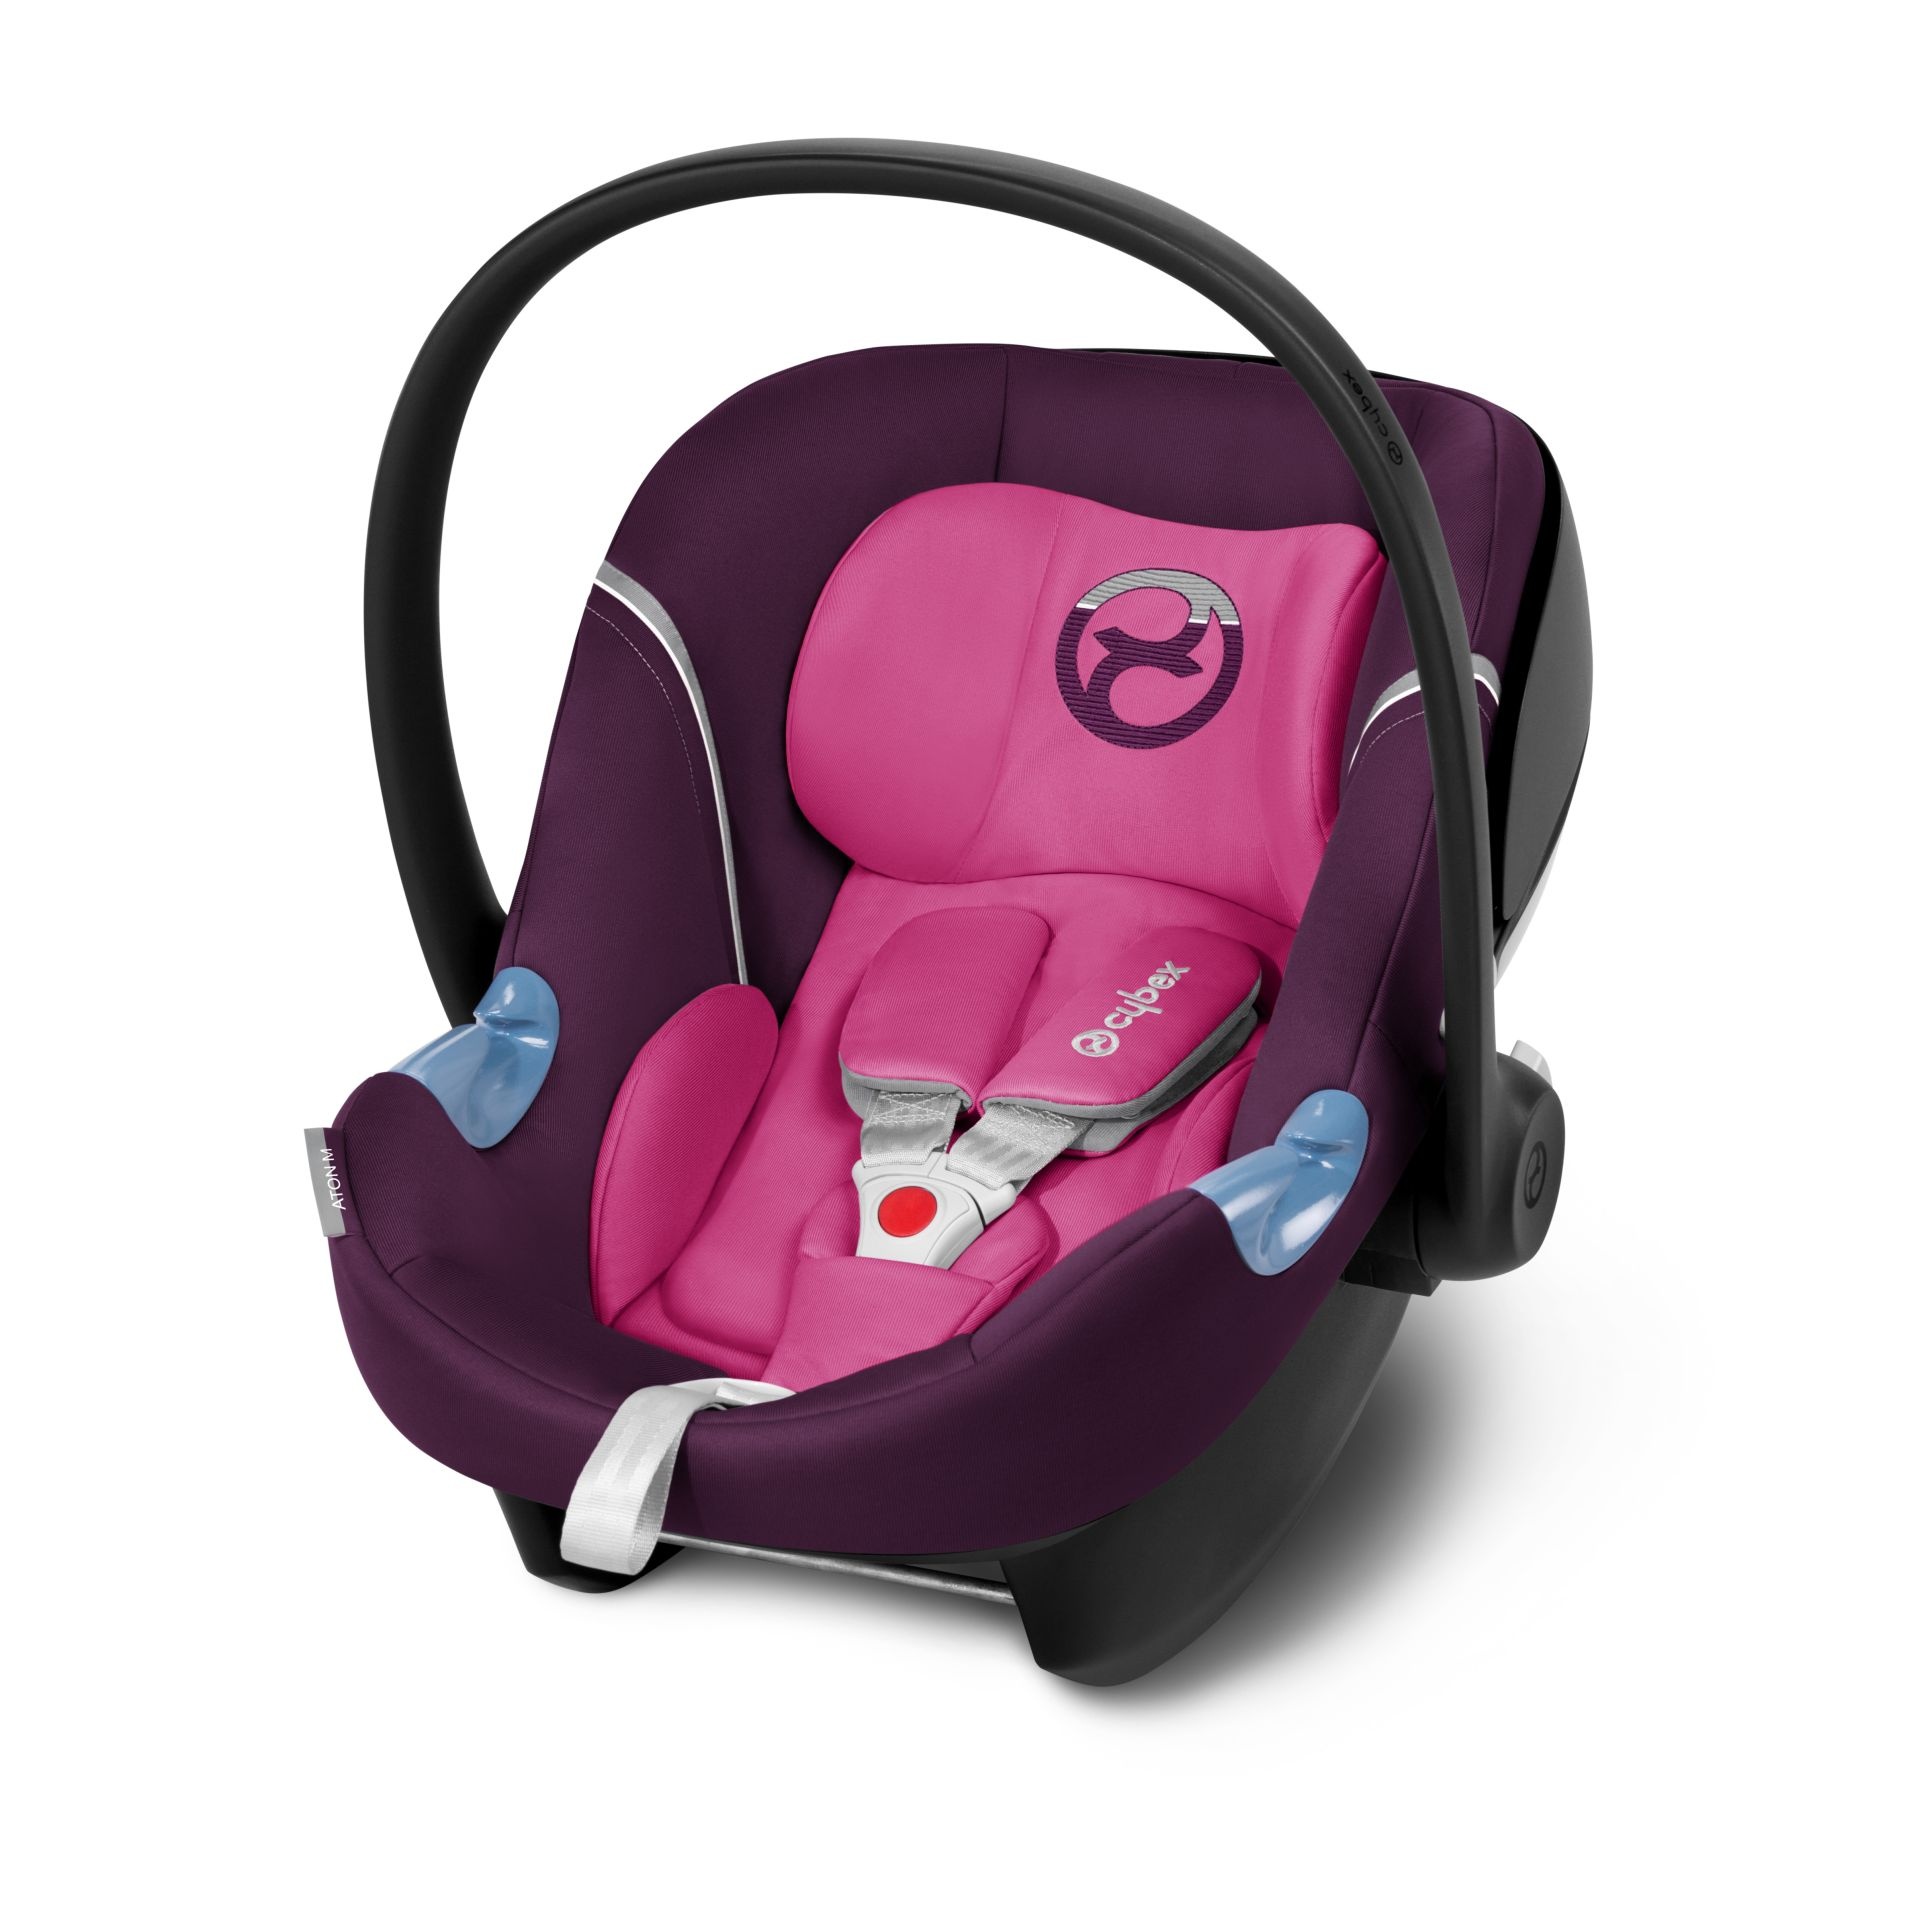 Pink Infant Car Seat Insert